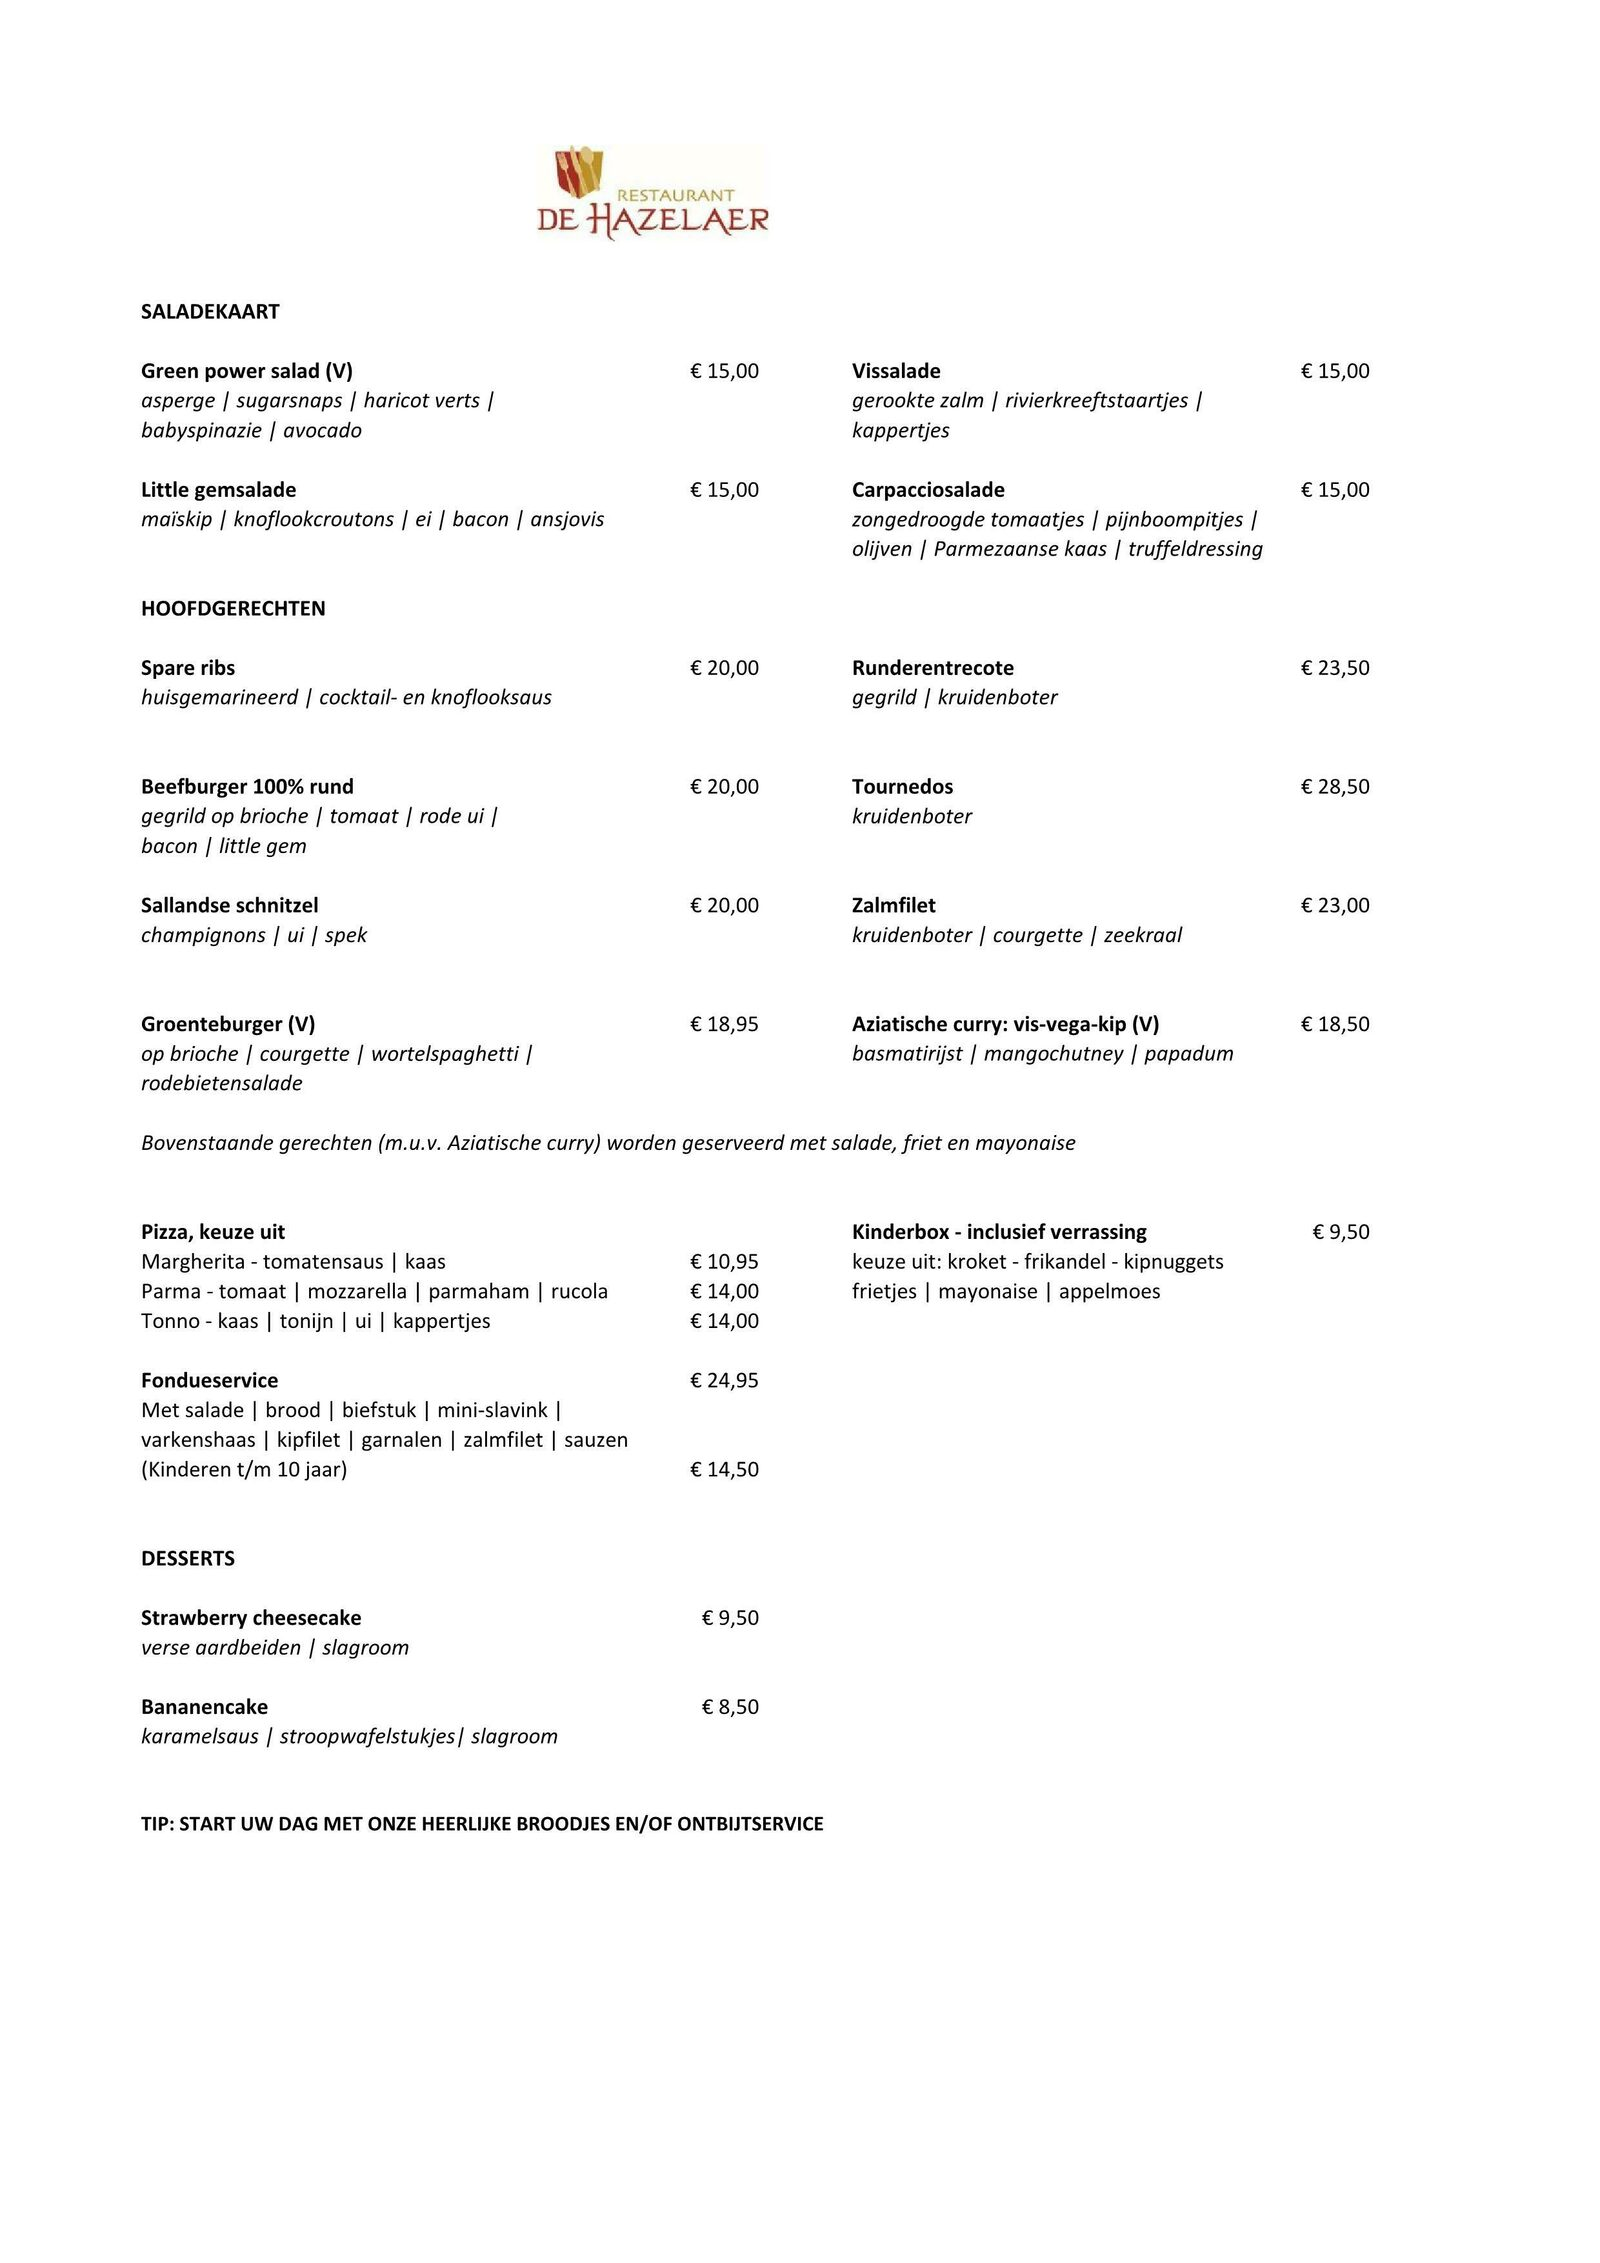 Broodjes en Take Away Menu van restaurant De Hazelaer